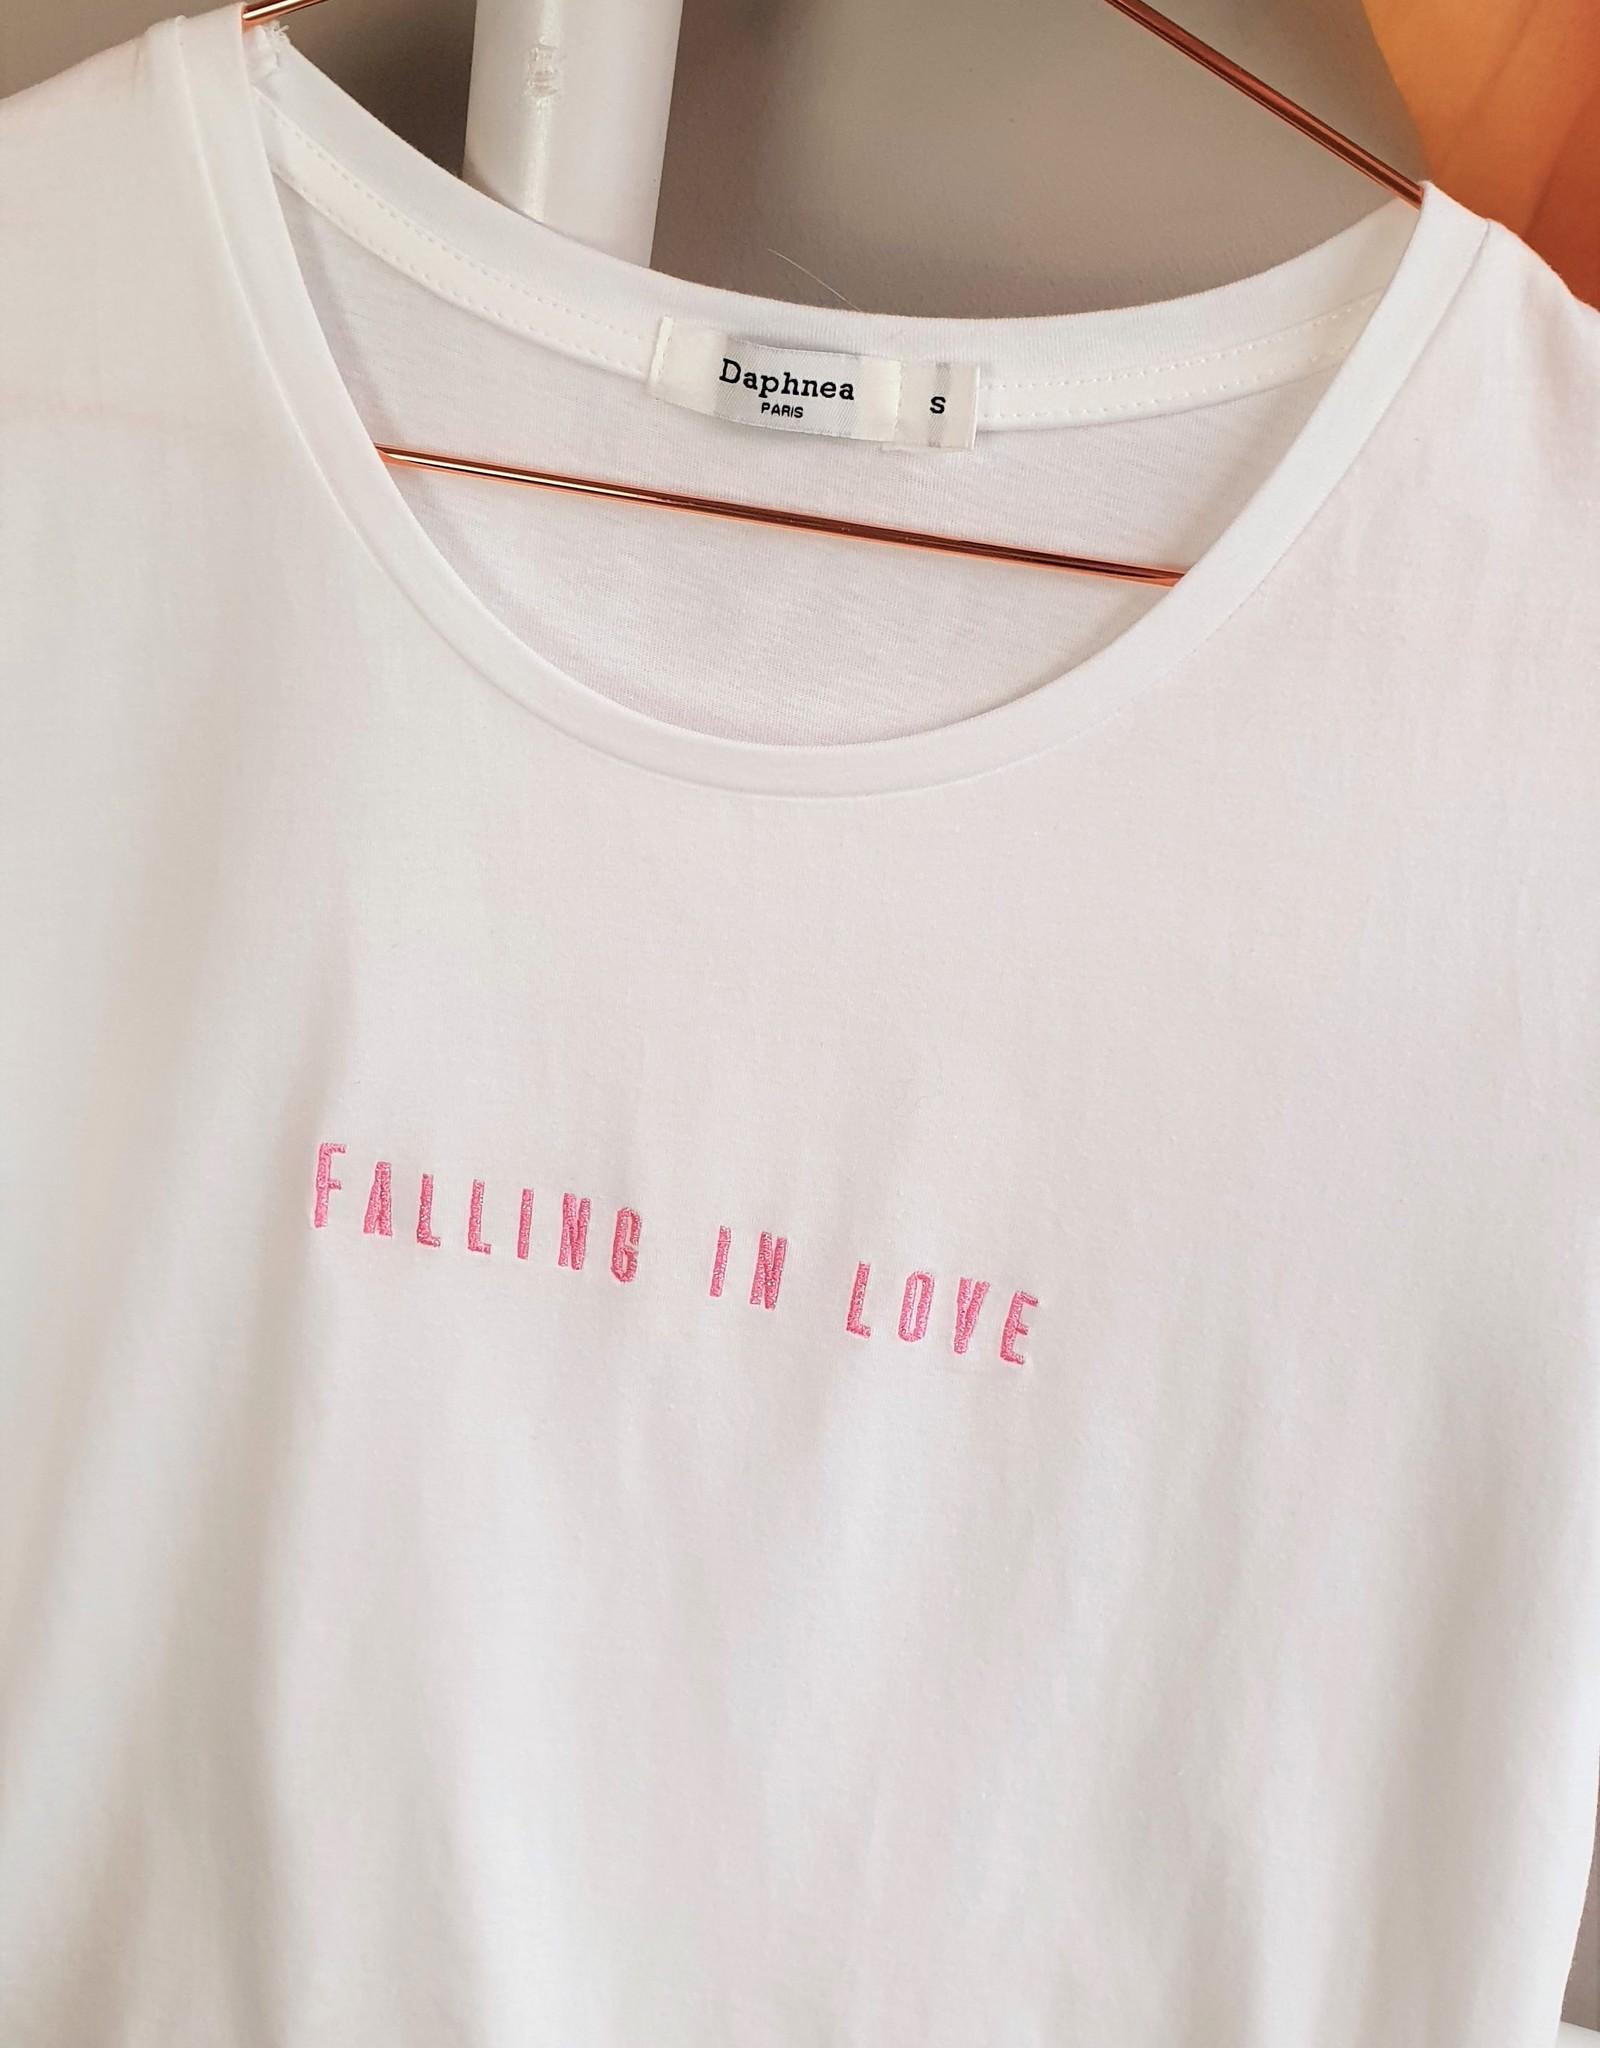 Shirt falling in love